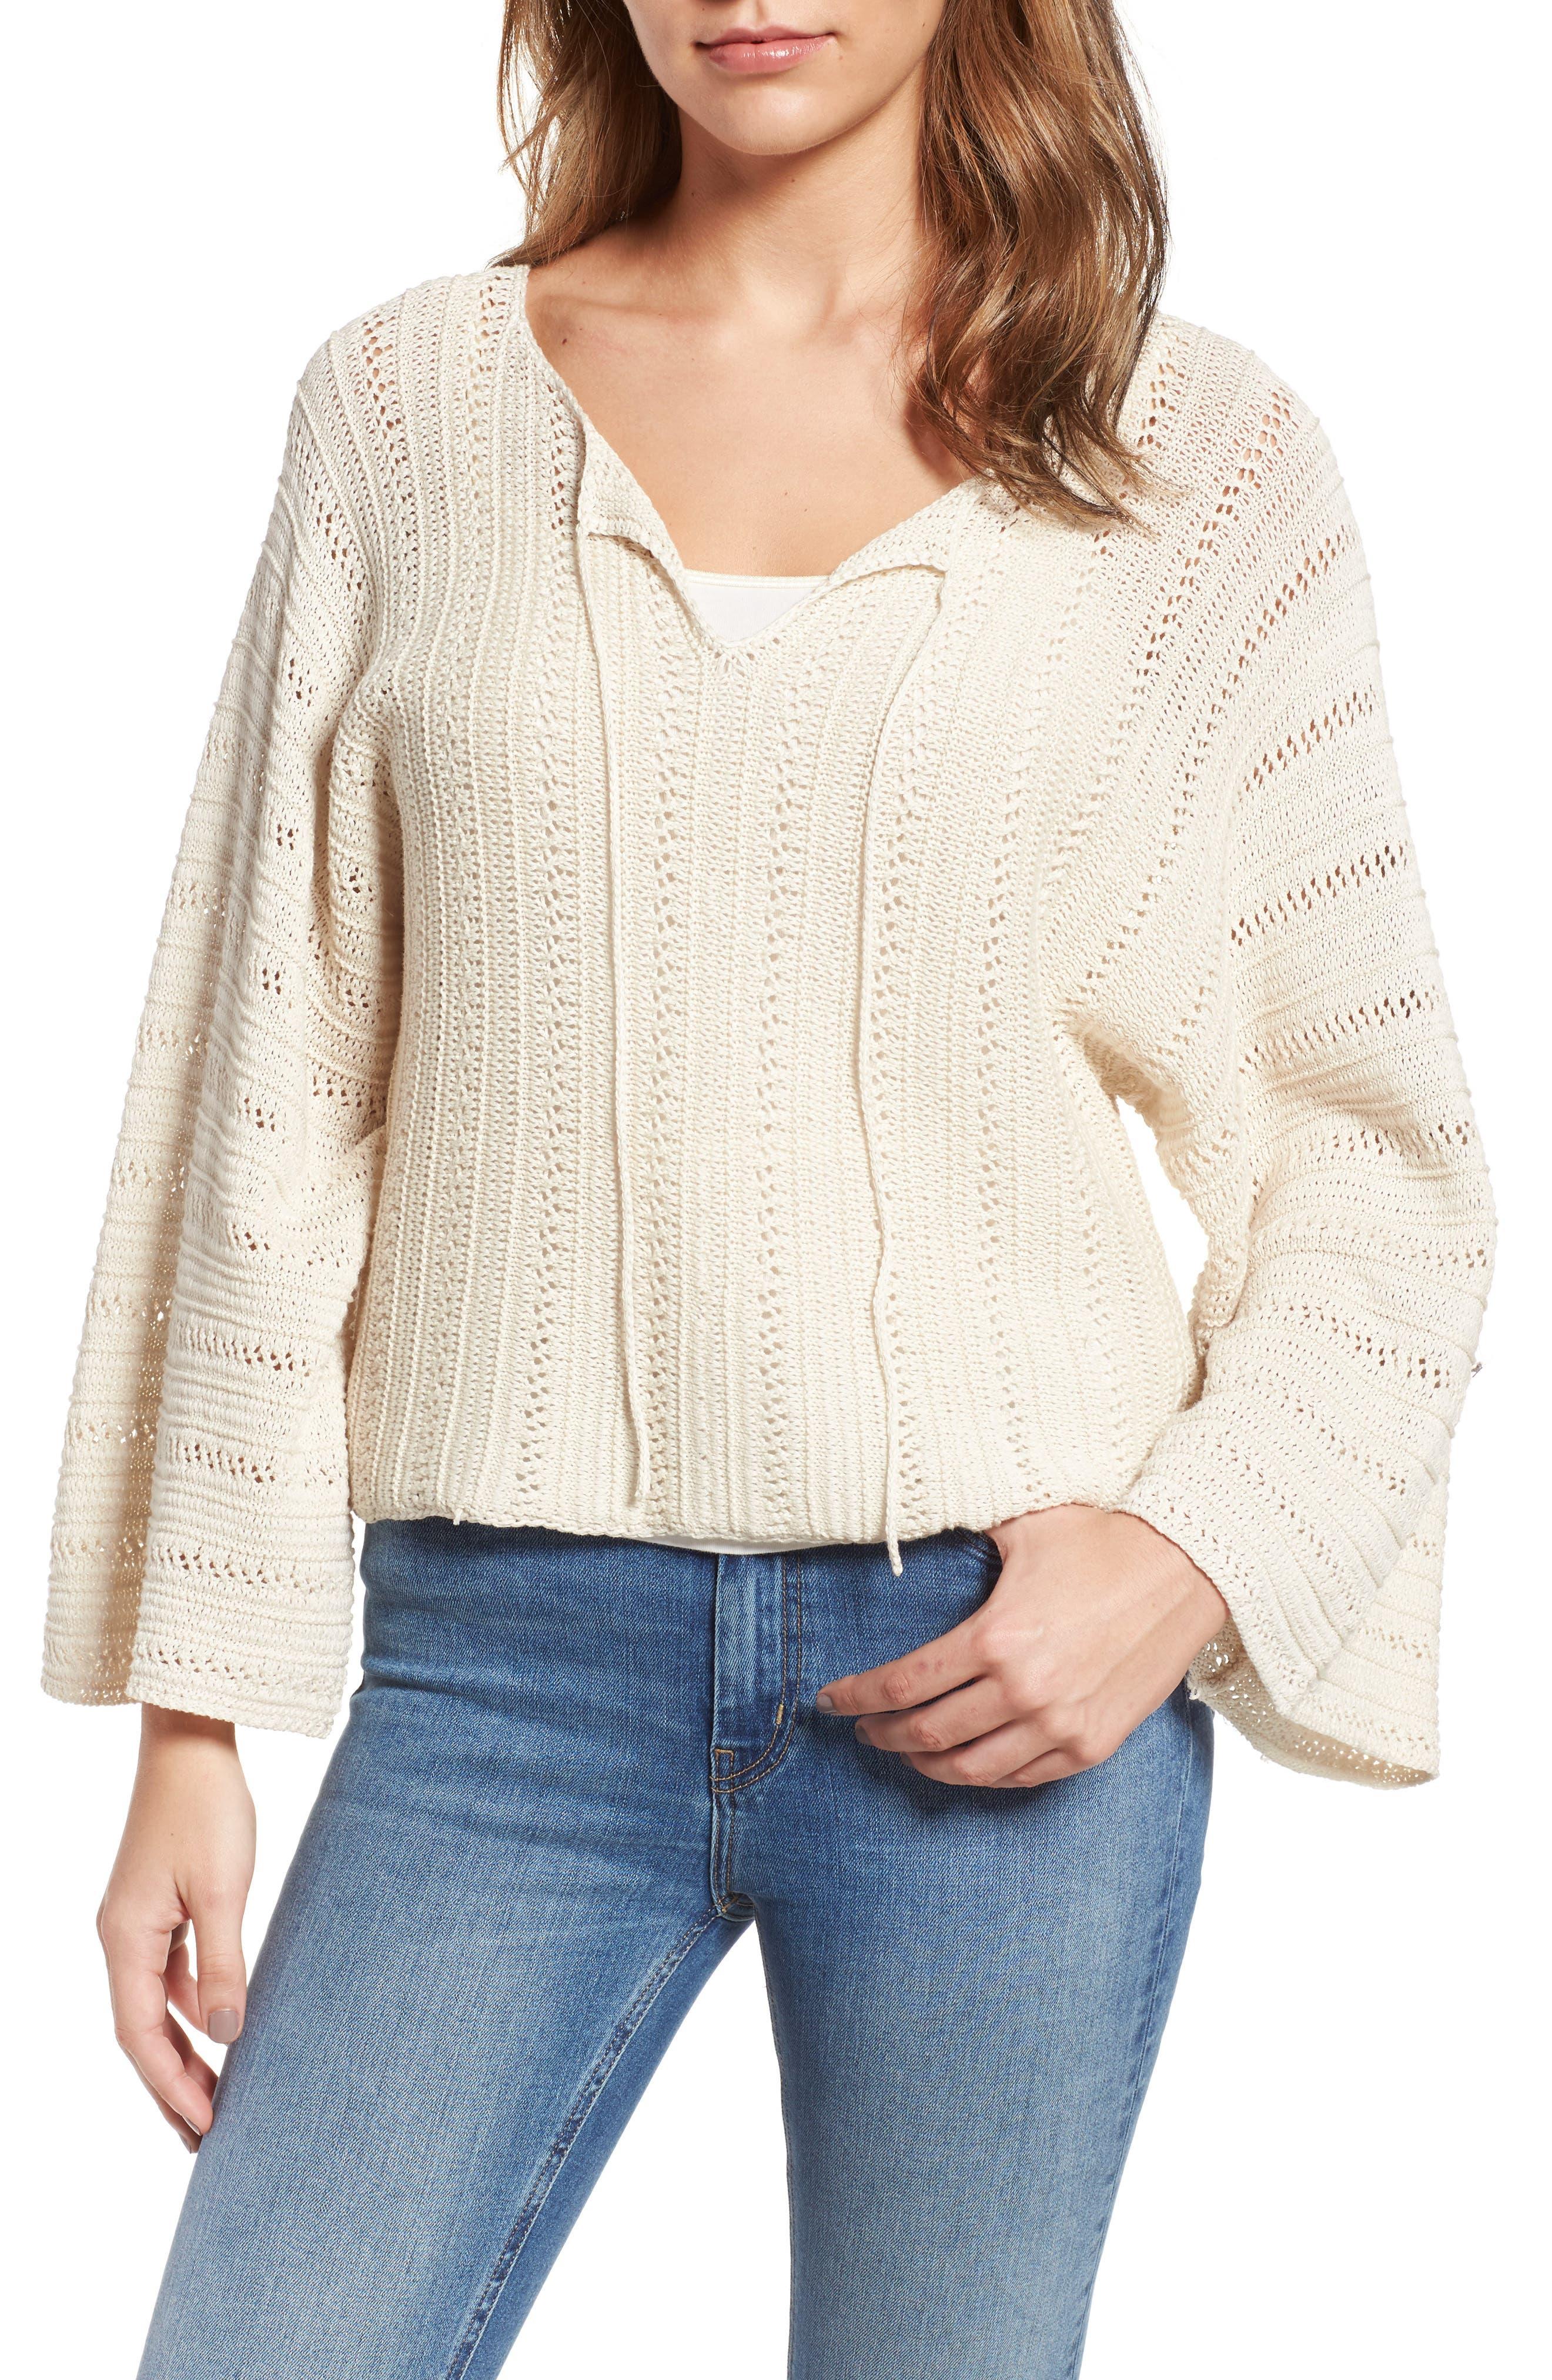 Ella Moss Caprisa Sweater